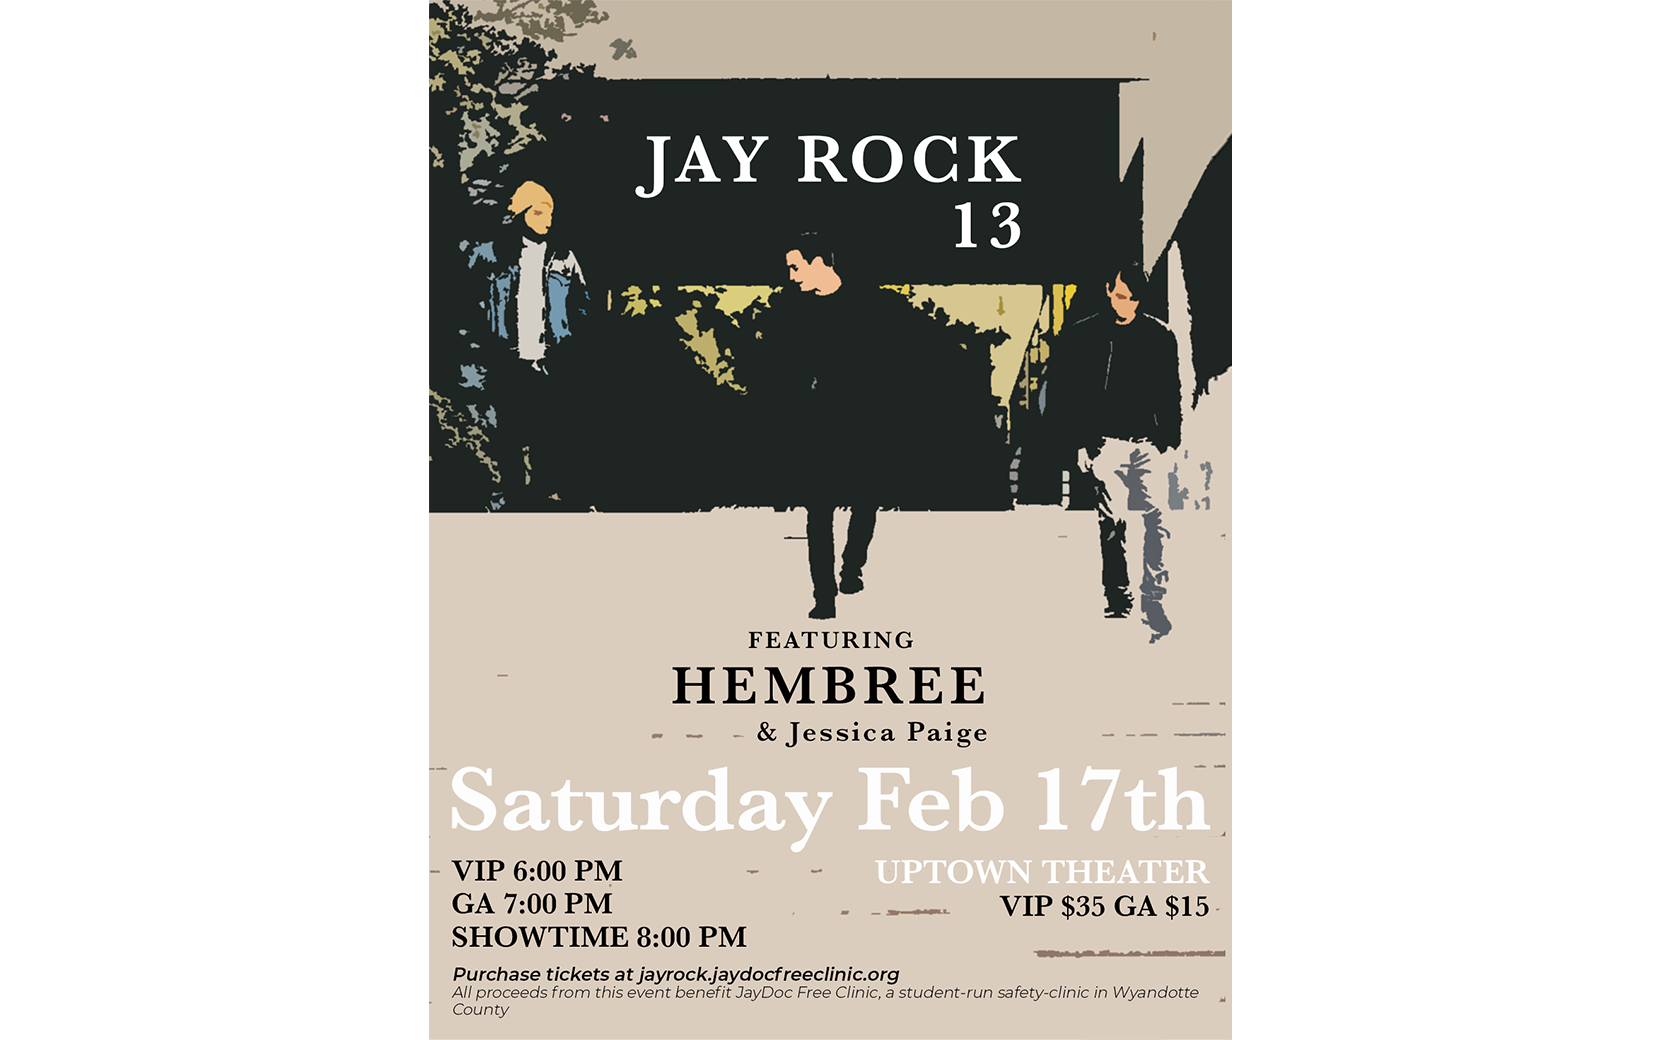 Jay Rock 13 Event Flyer